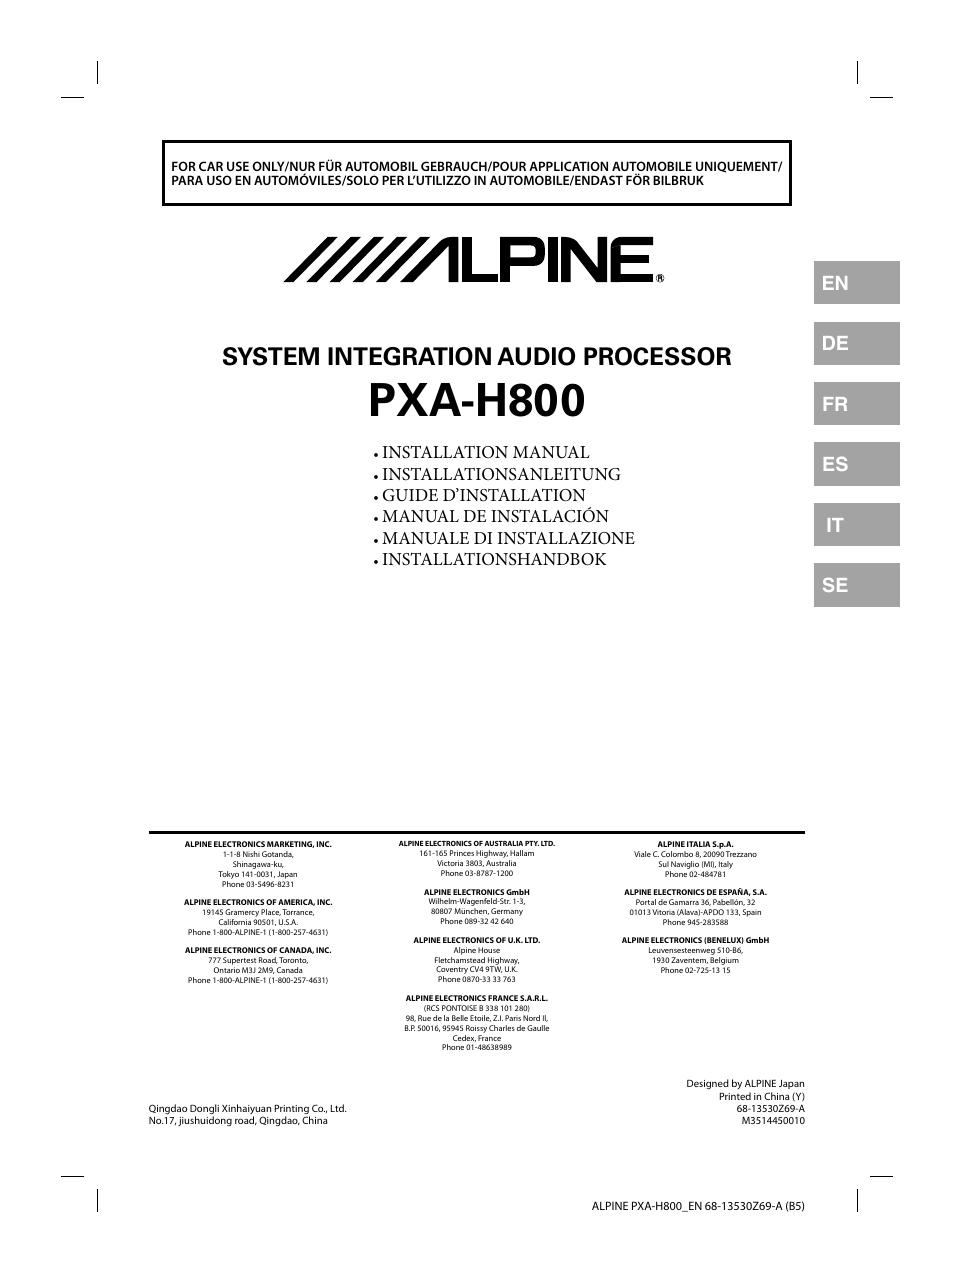 alpine pxa h800 user manual 21 pages rh manualsdir com Alpine PXA- H100 Review Alpine PXA H900